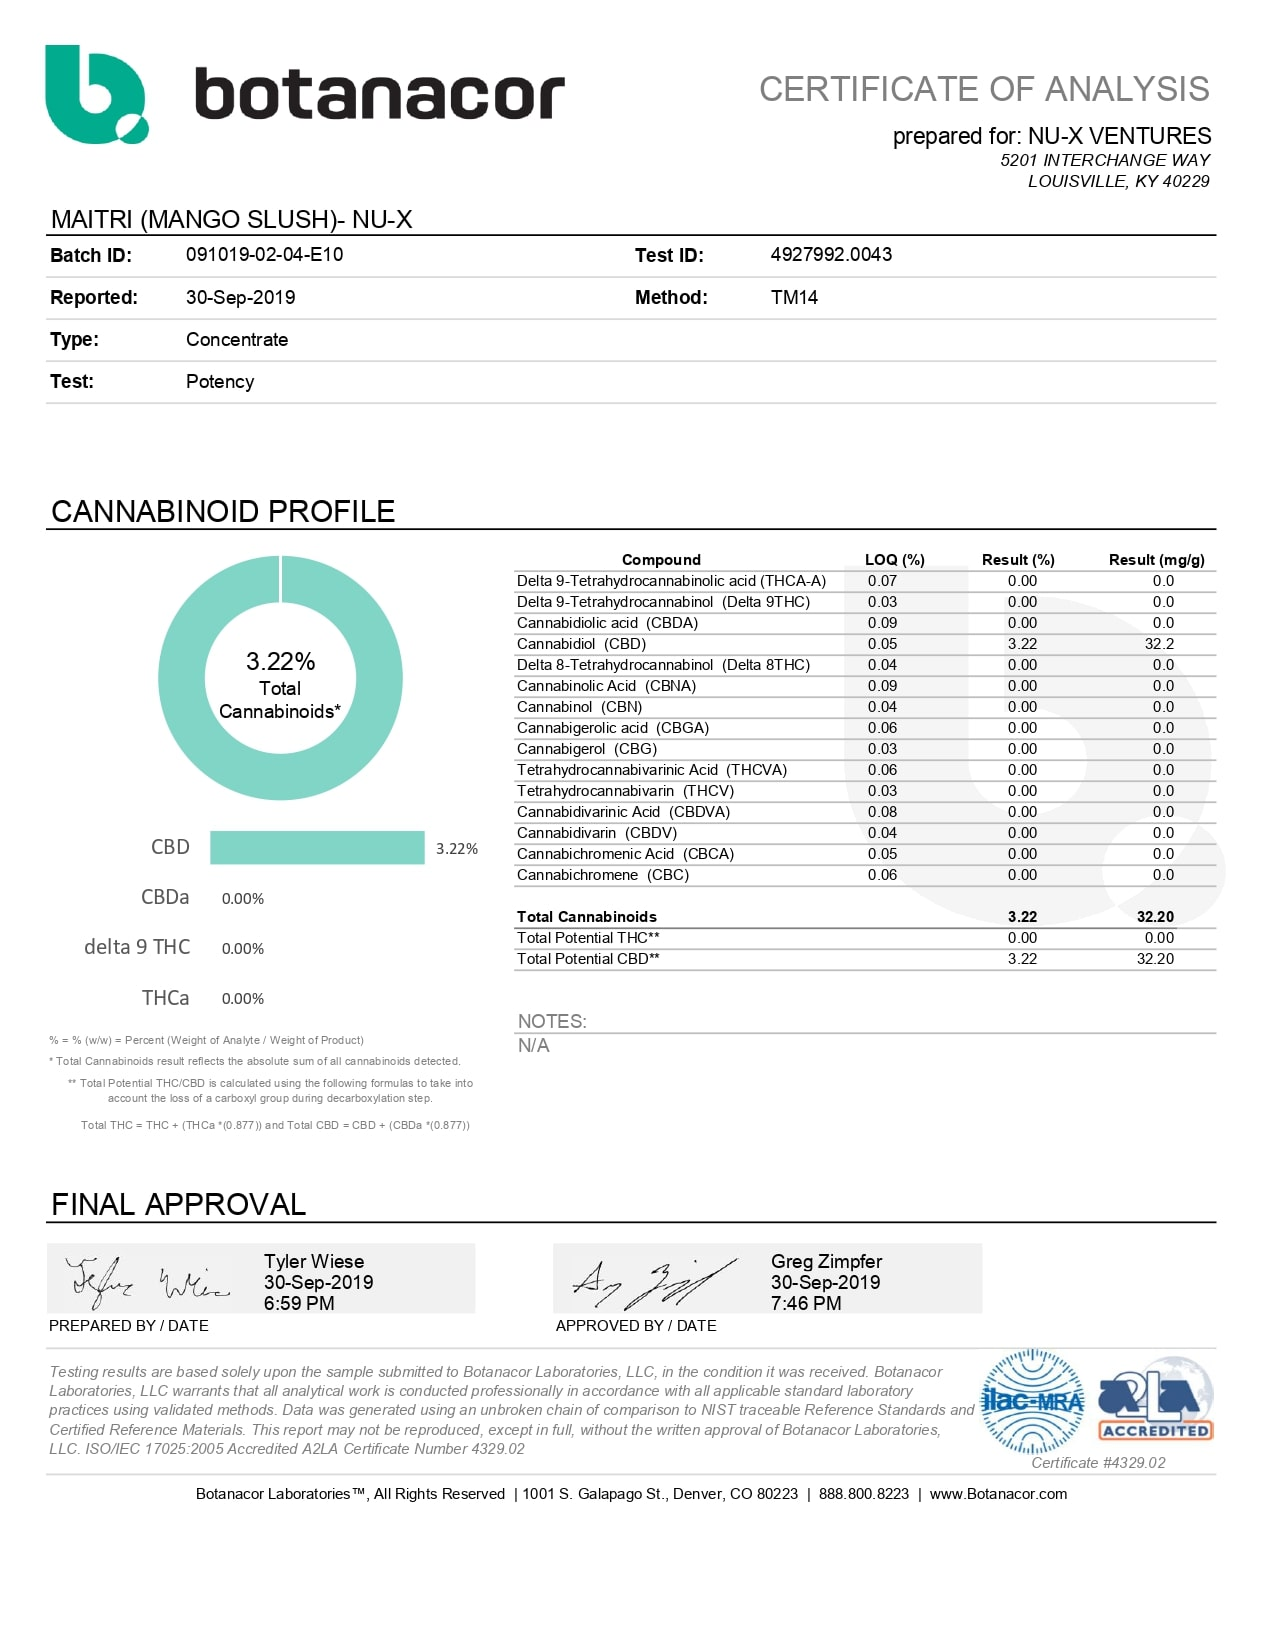 NU-X CBD eLiquid Mango Lychee - Maitri Lab Report 1000mg